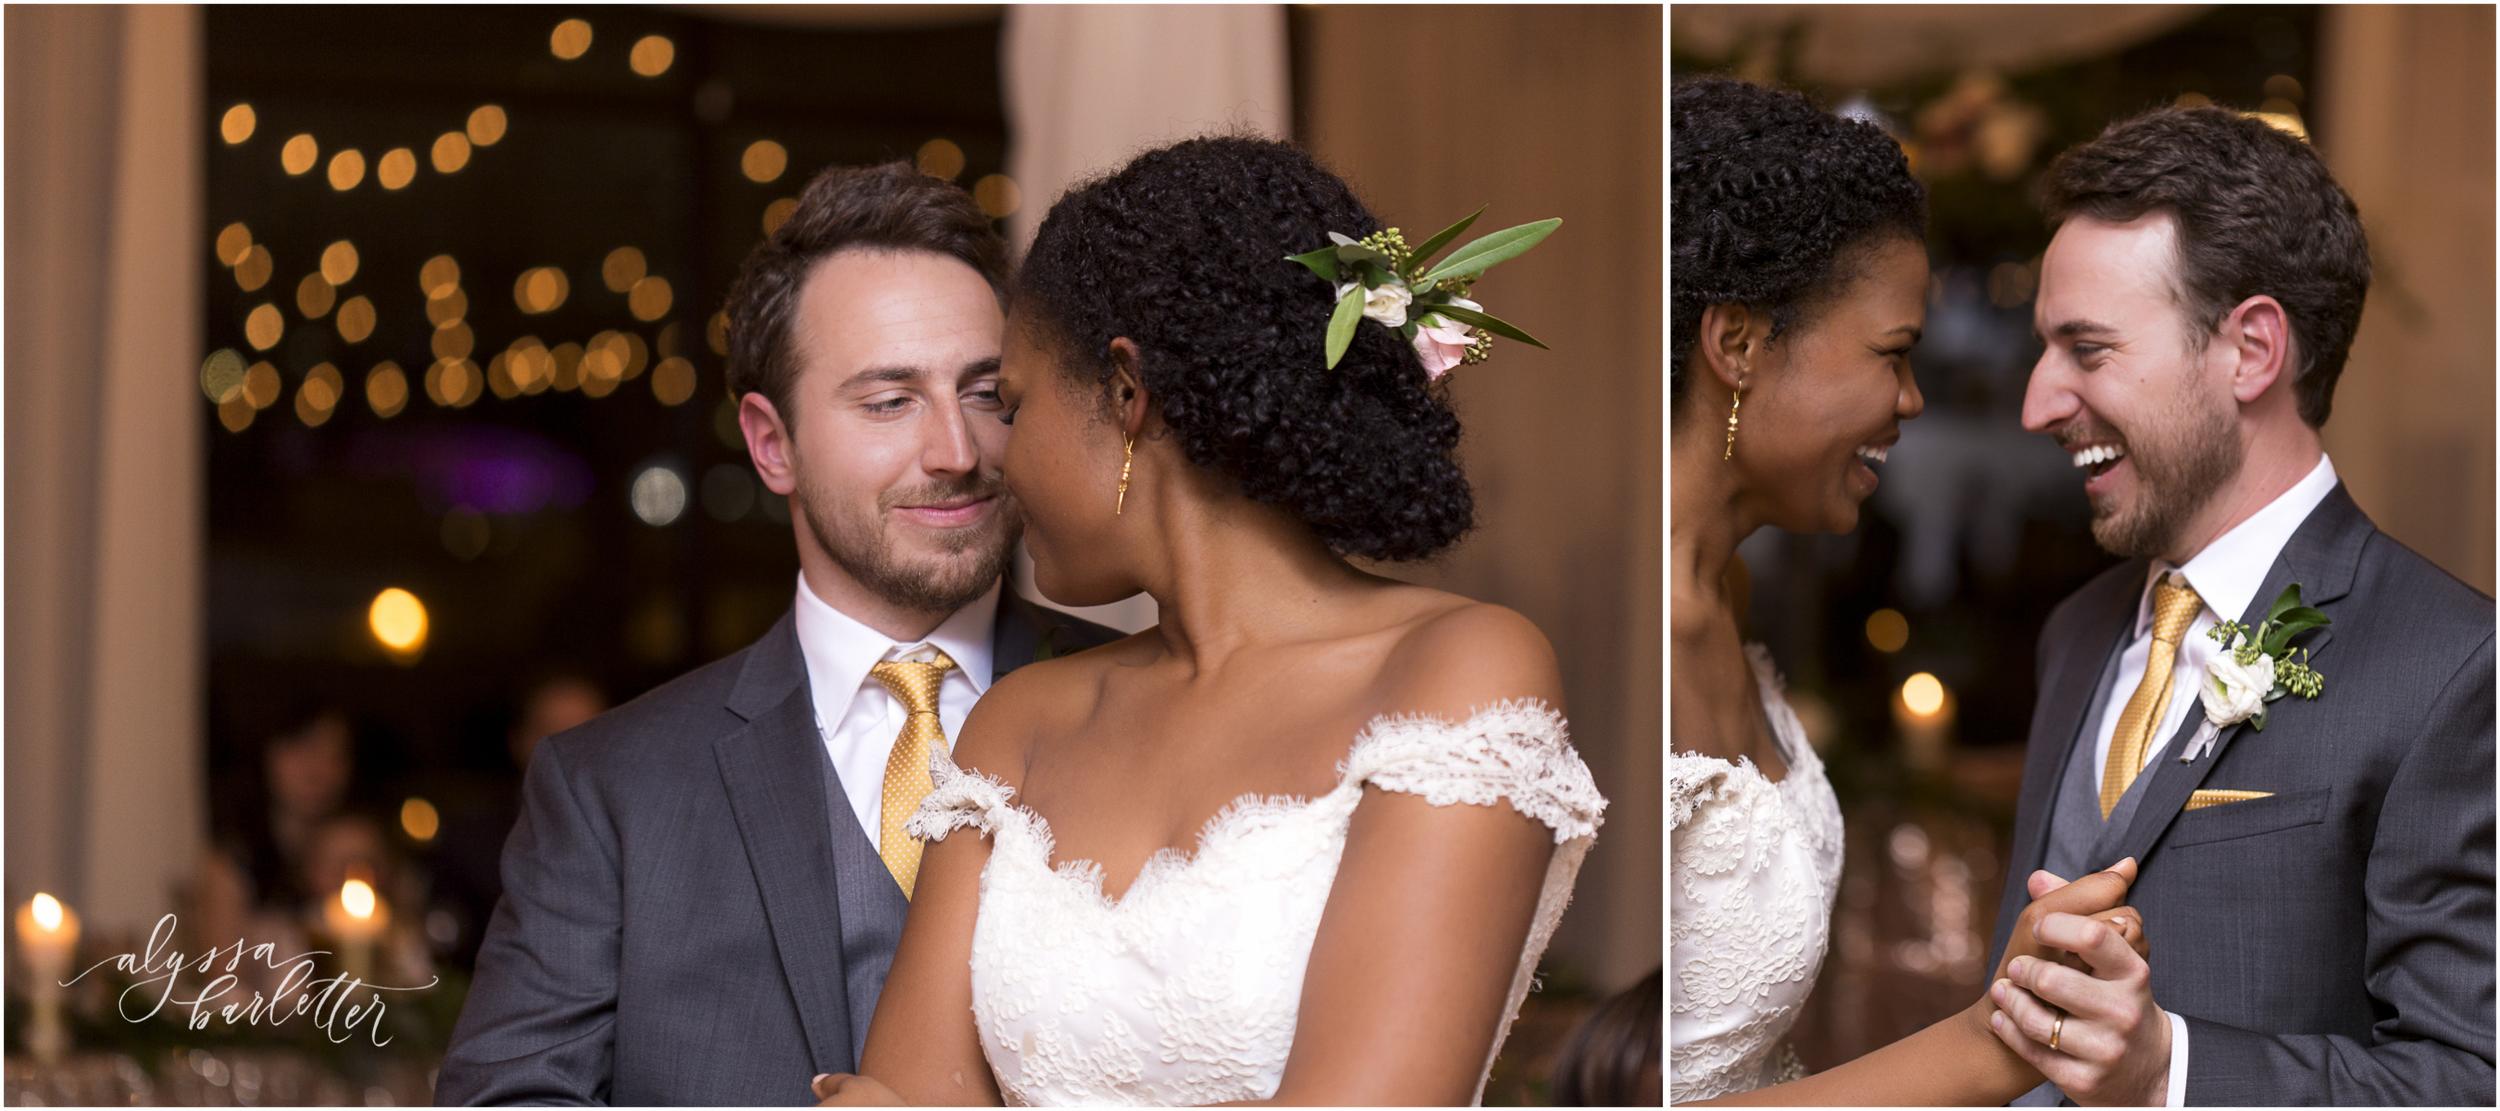 the bauer kansas city wedding photos-28.jpg